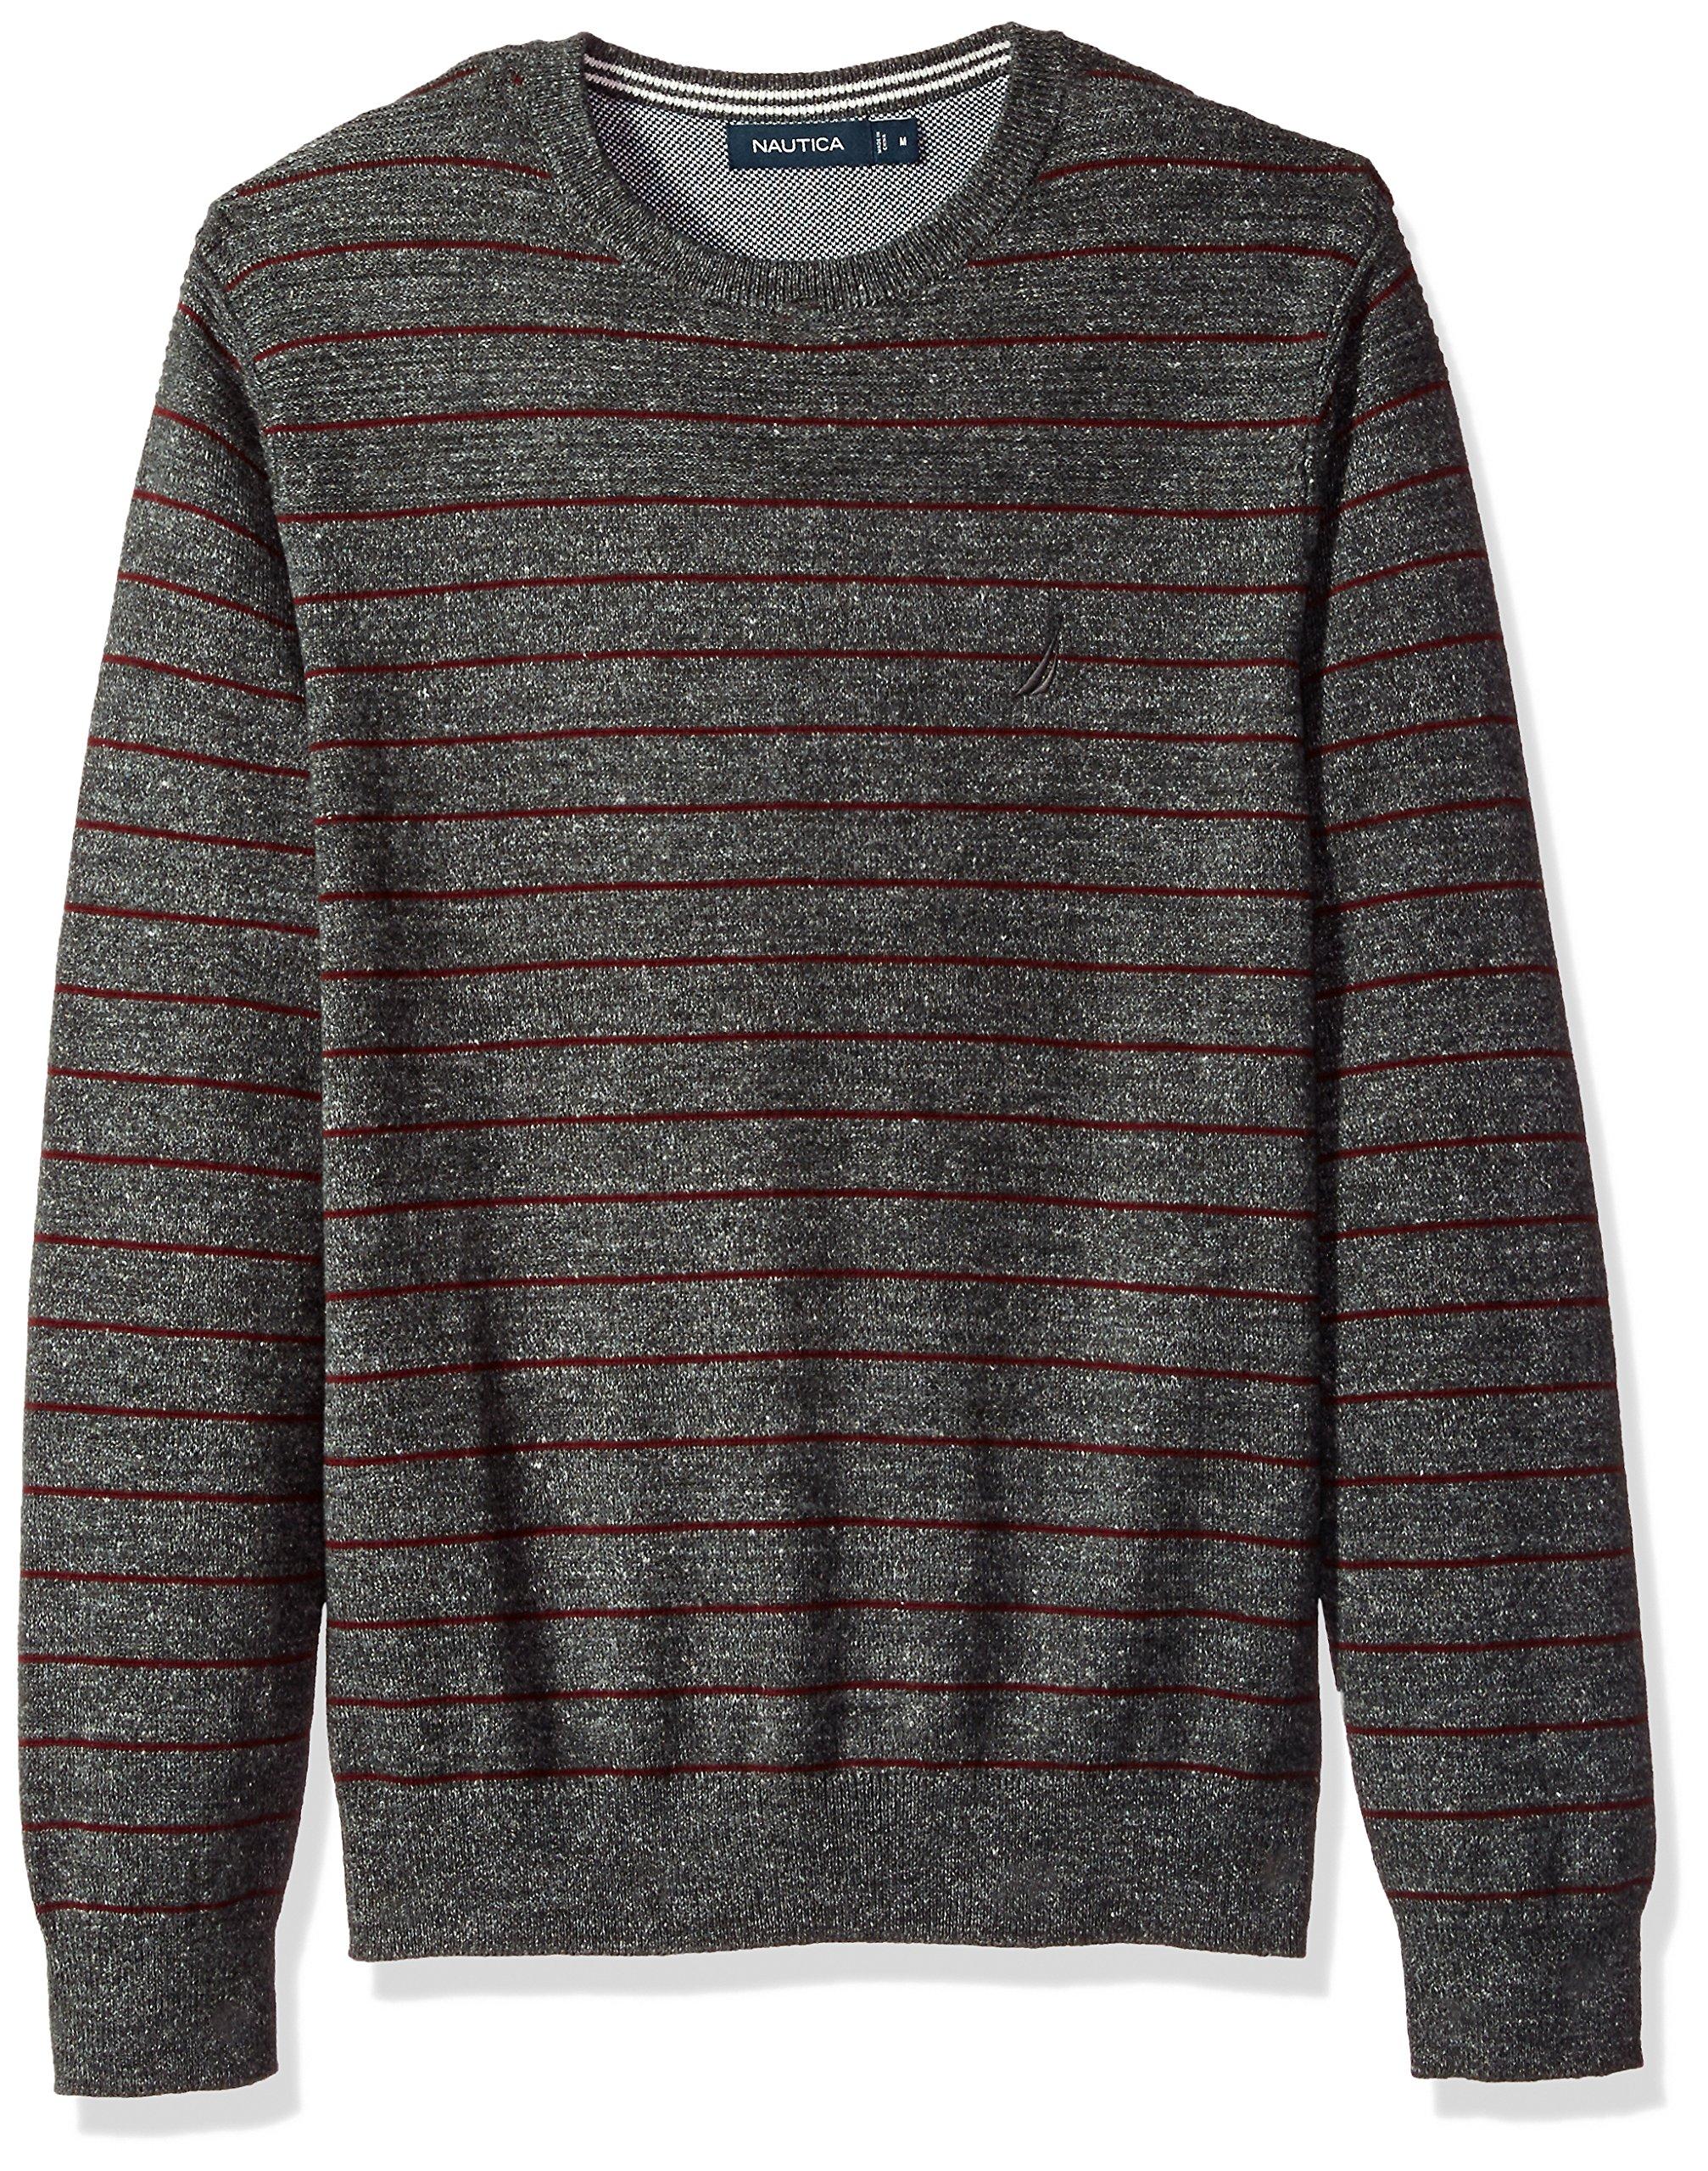 Nautica Men's Standard Long Sleeve Striped Crew Neck Sweater, True Black, X-Large